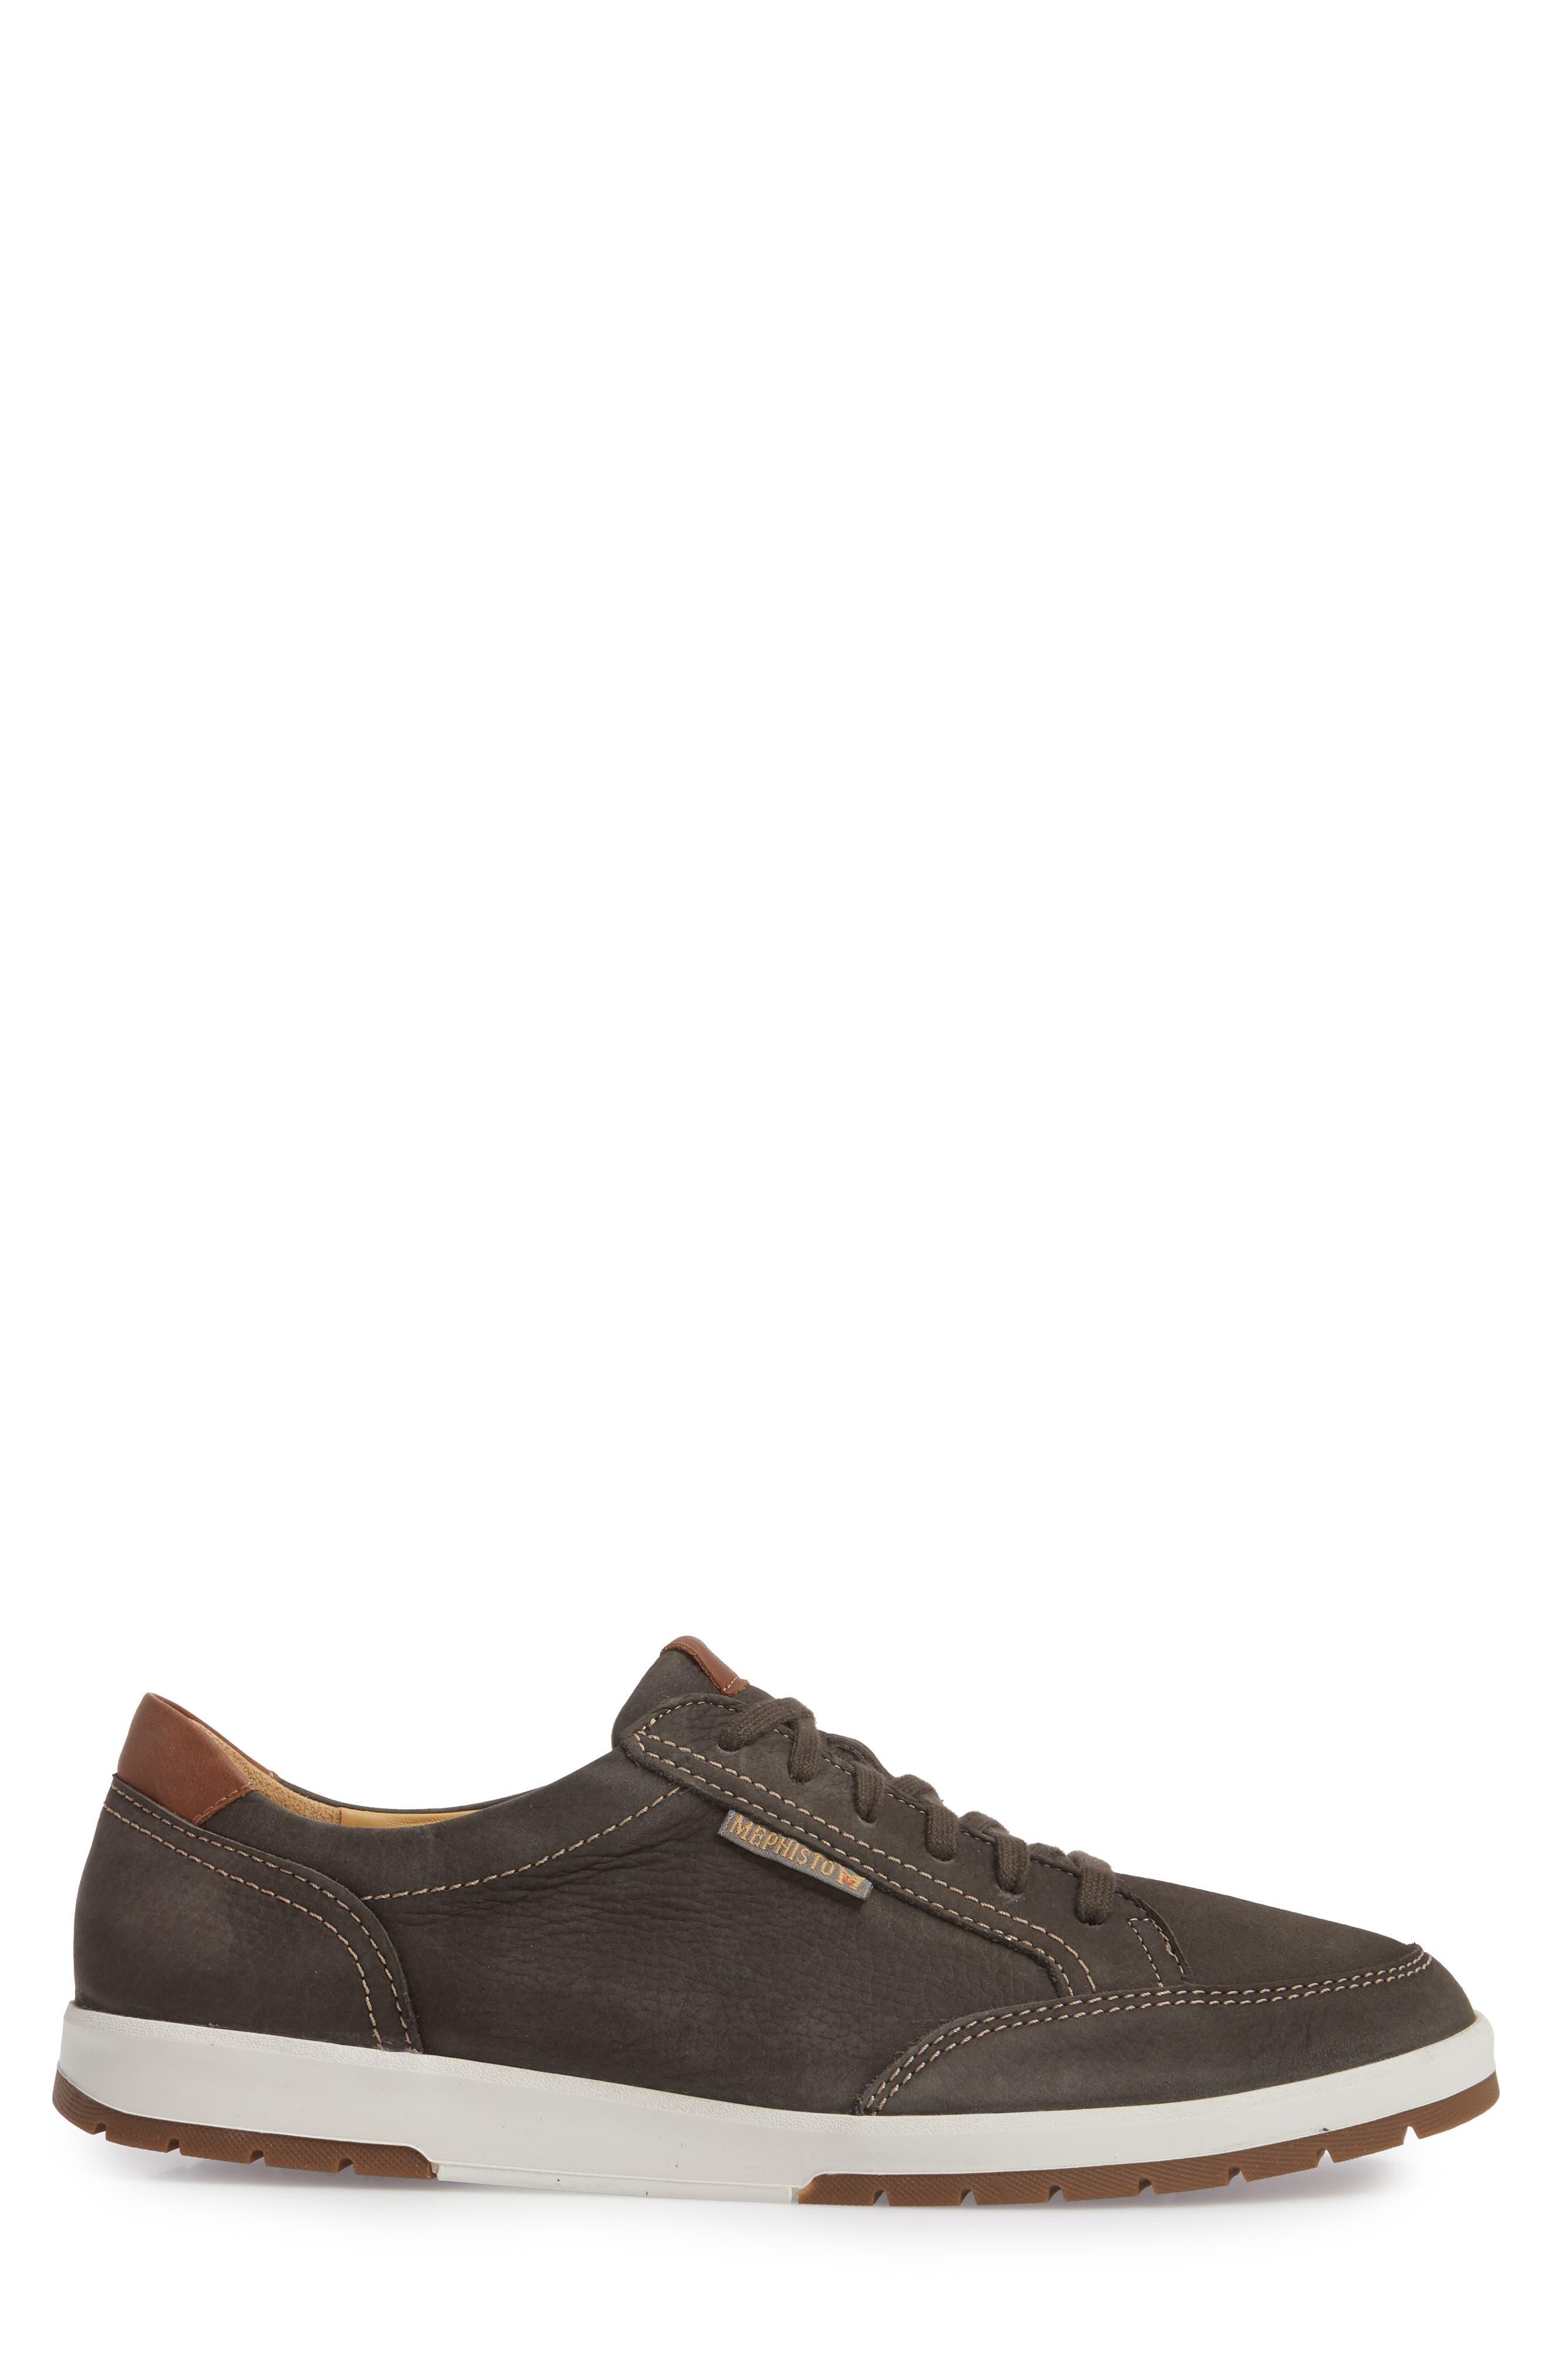 MEPHISTO, 'Ludo' Sneaker, Alternate thumbnail 3, color, GRAPHITE